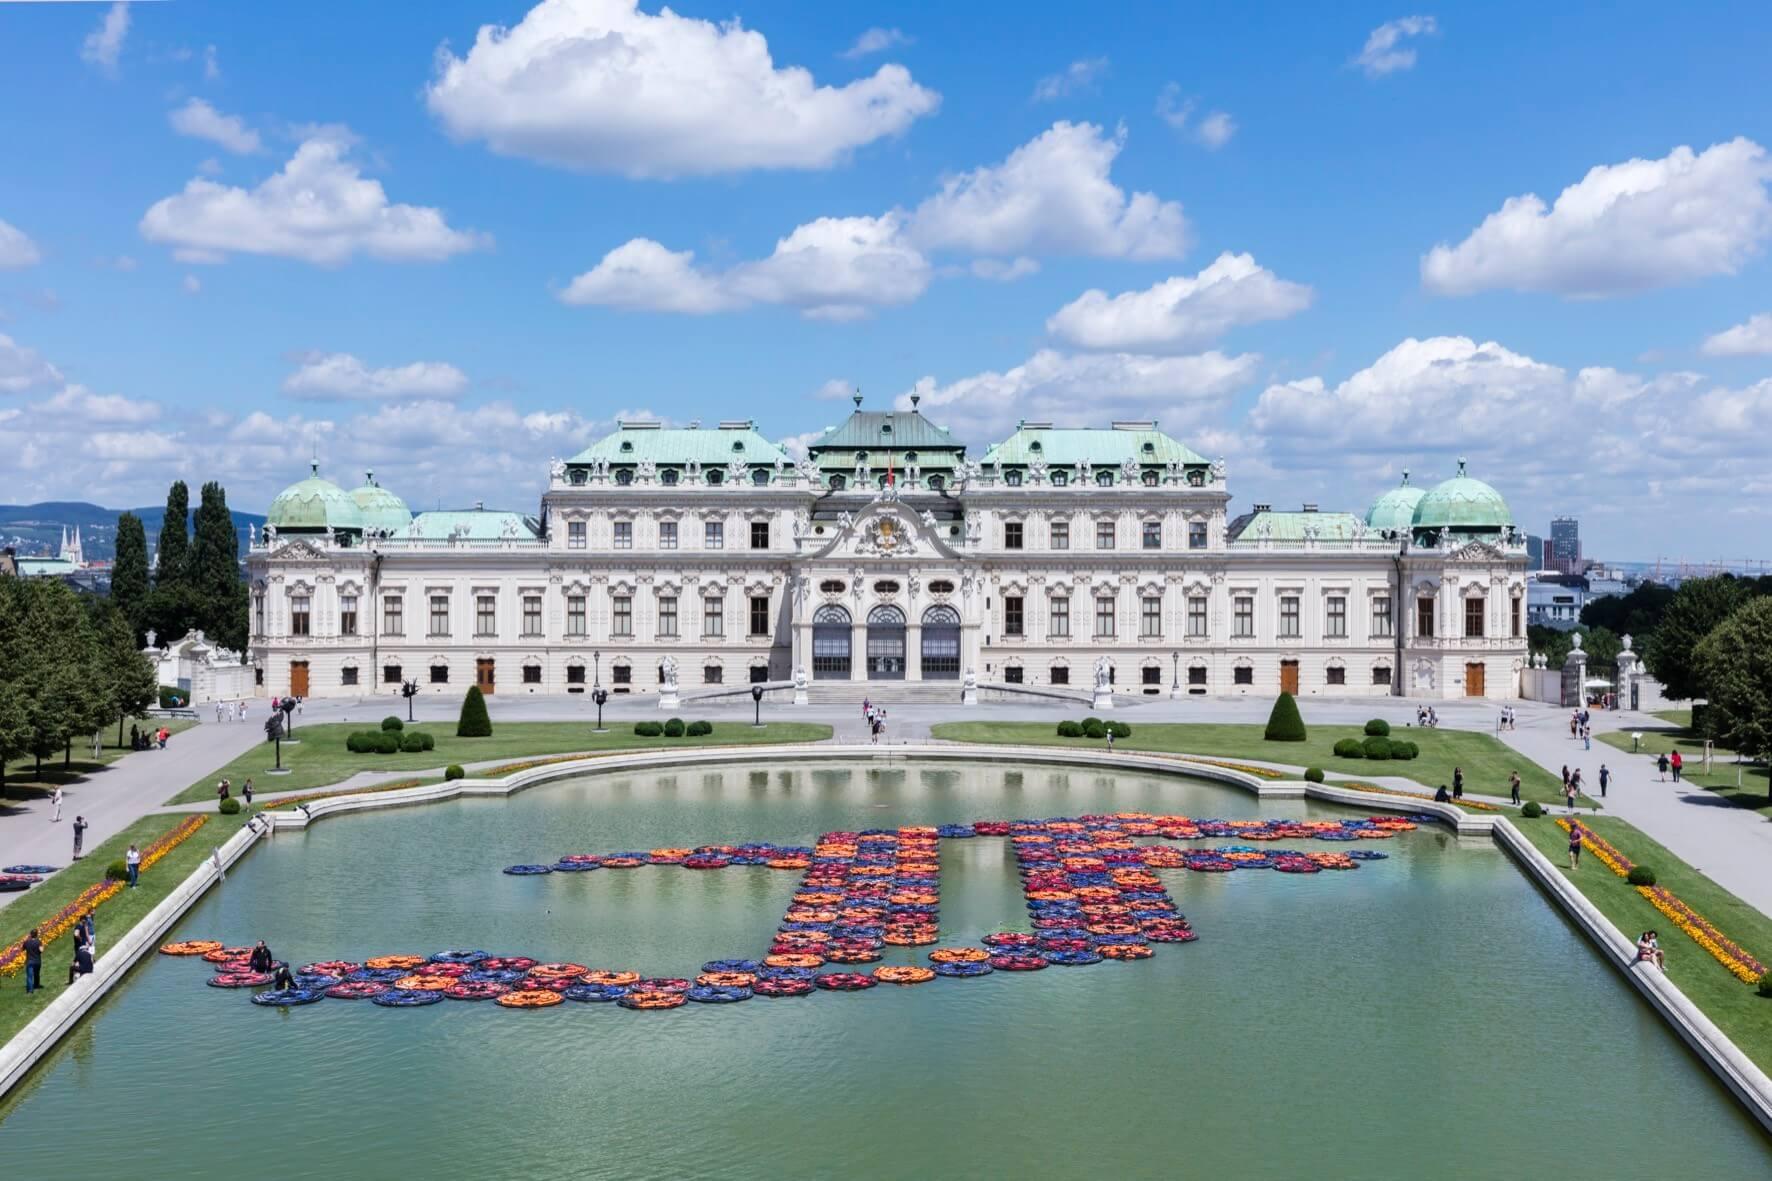 © Ai Weiwei Studio, Foto: © Belvedere, Wien 1005 Schwimmwesten, PVC, Polyethylenschaum 4876,5 x 4700 x 7,5 cm.